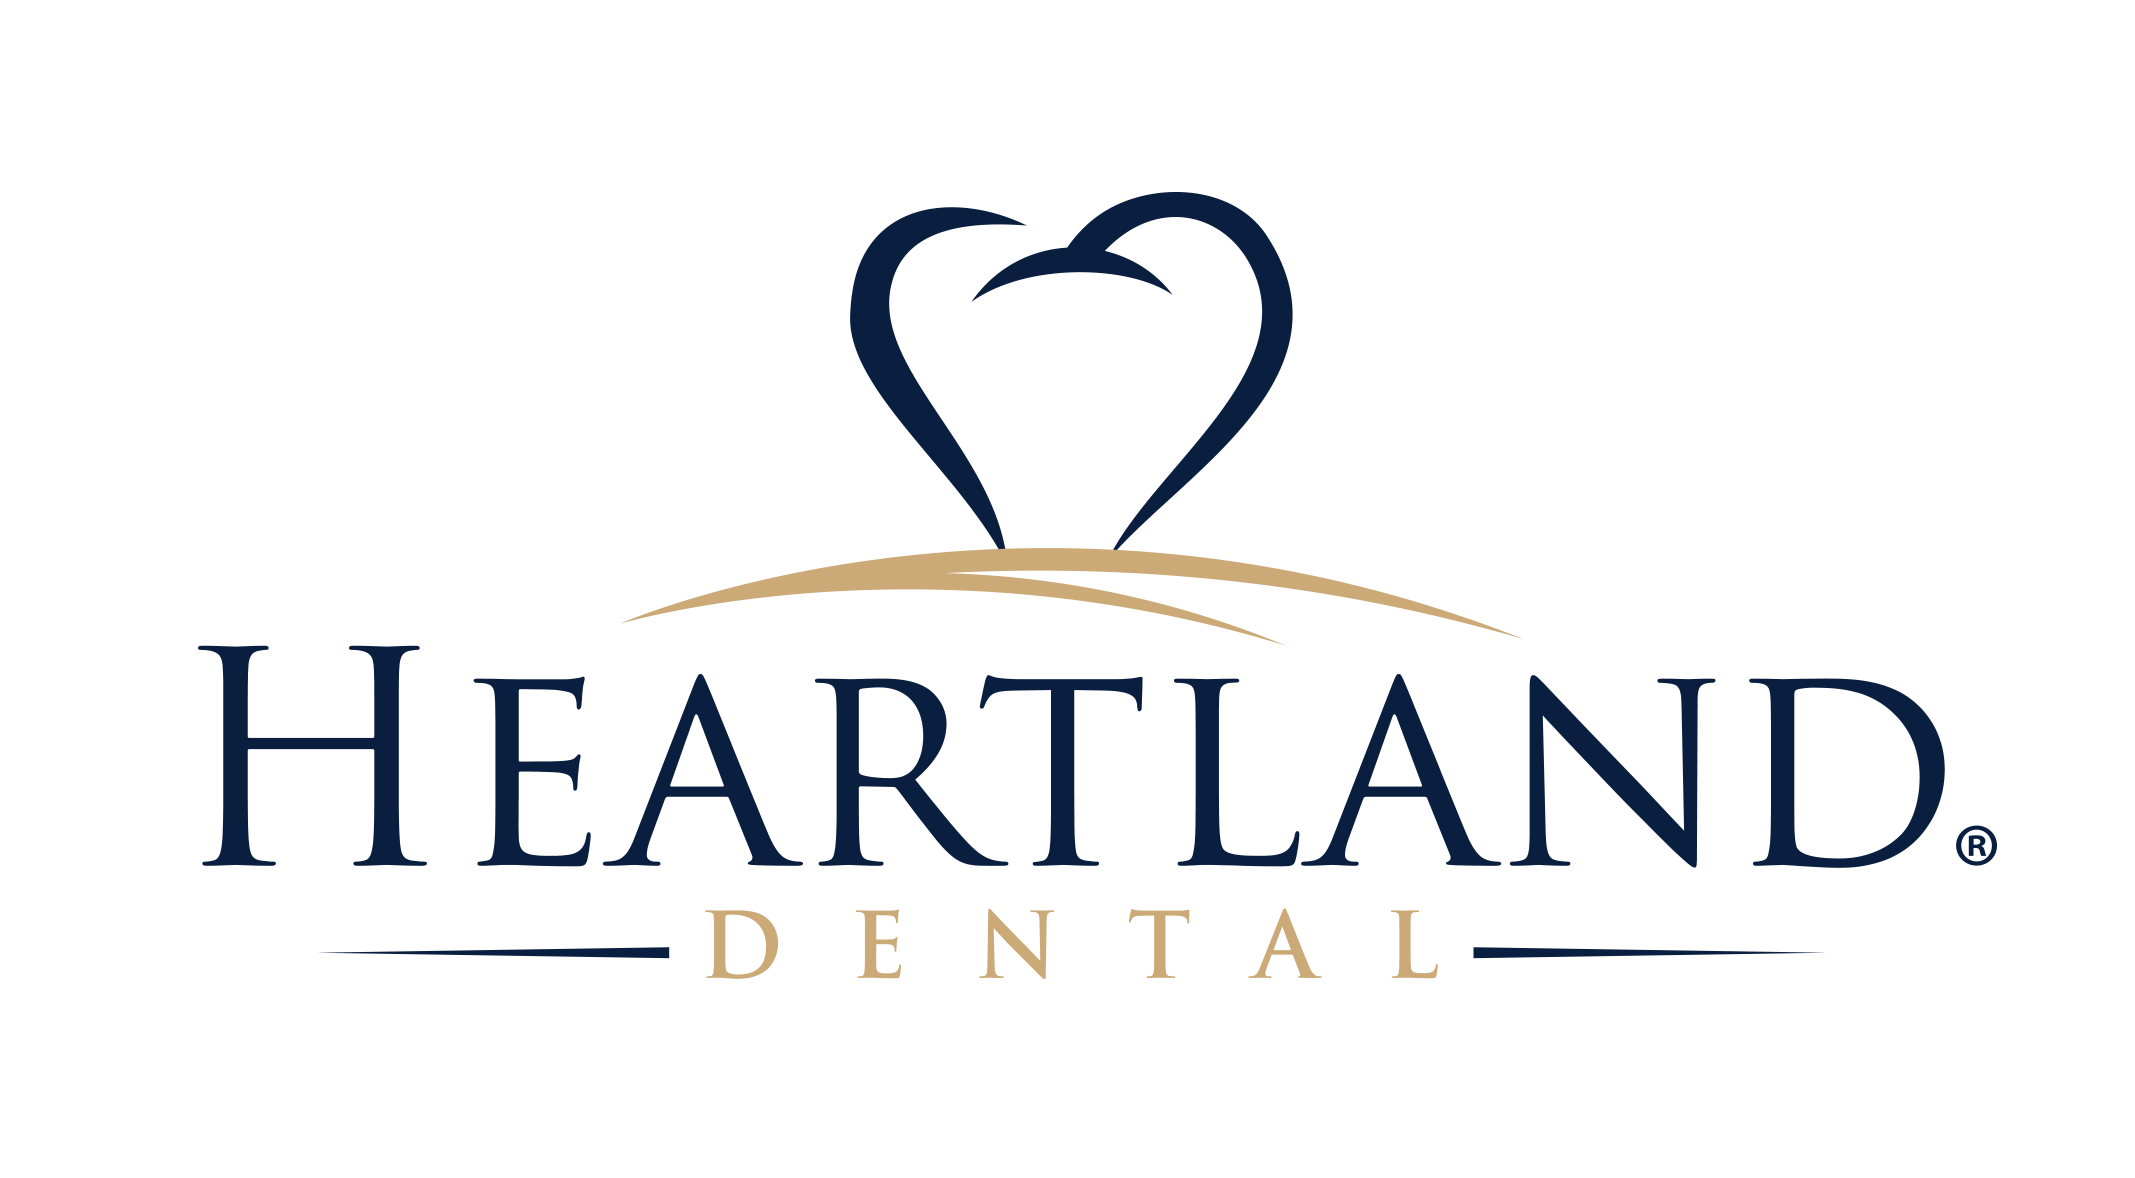 Heartland Dental Selects Dentira as its Clinical Supply Procurement Platform